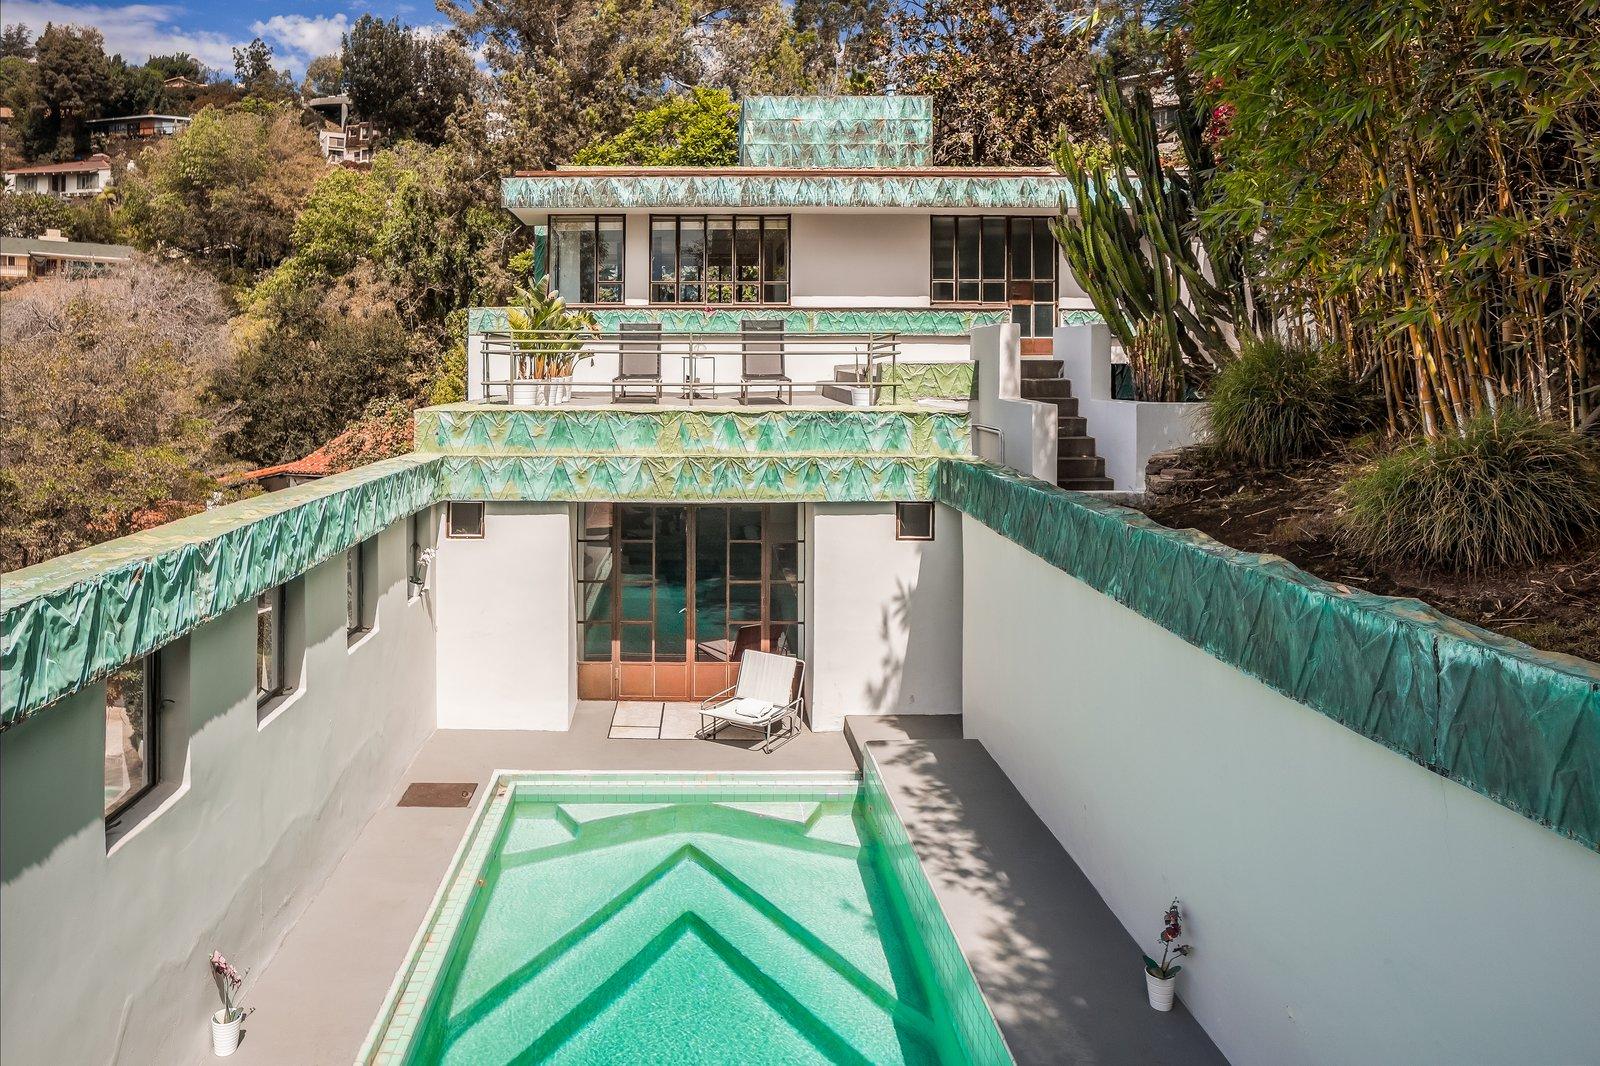 Samuel-Novarro House pool